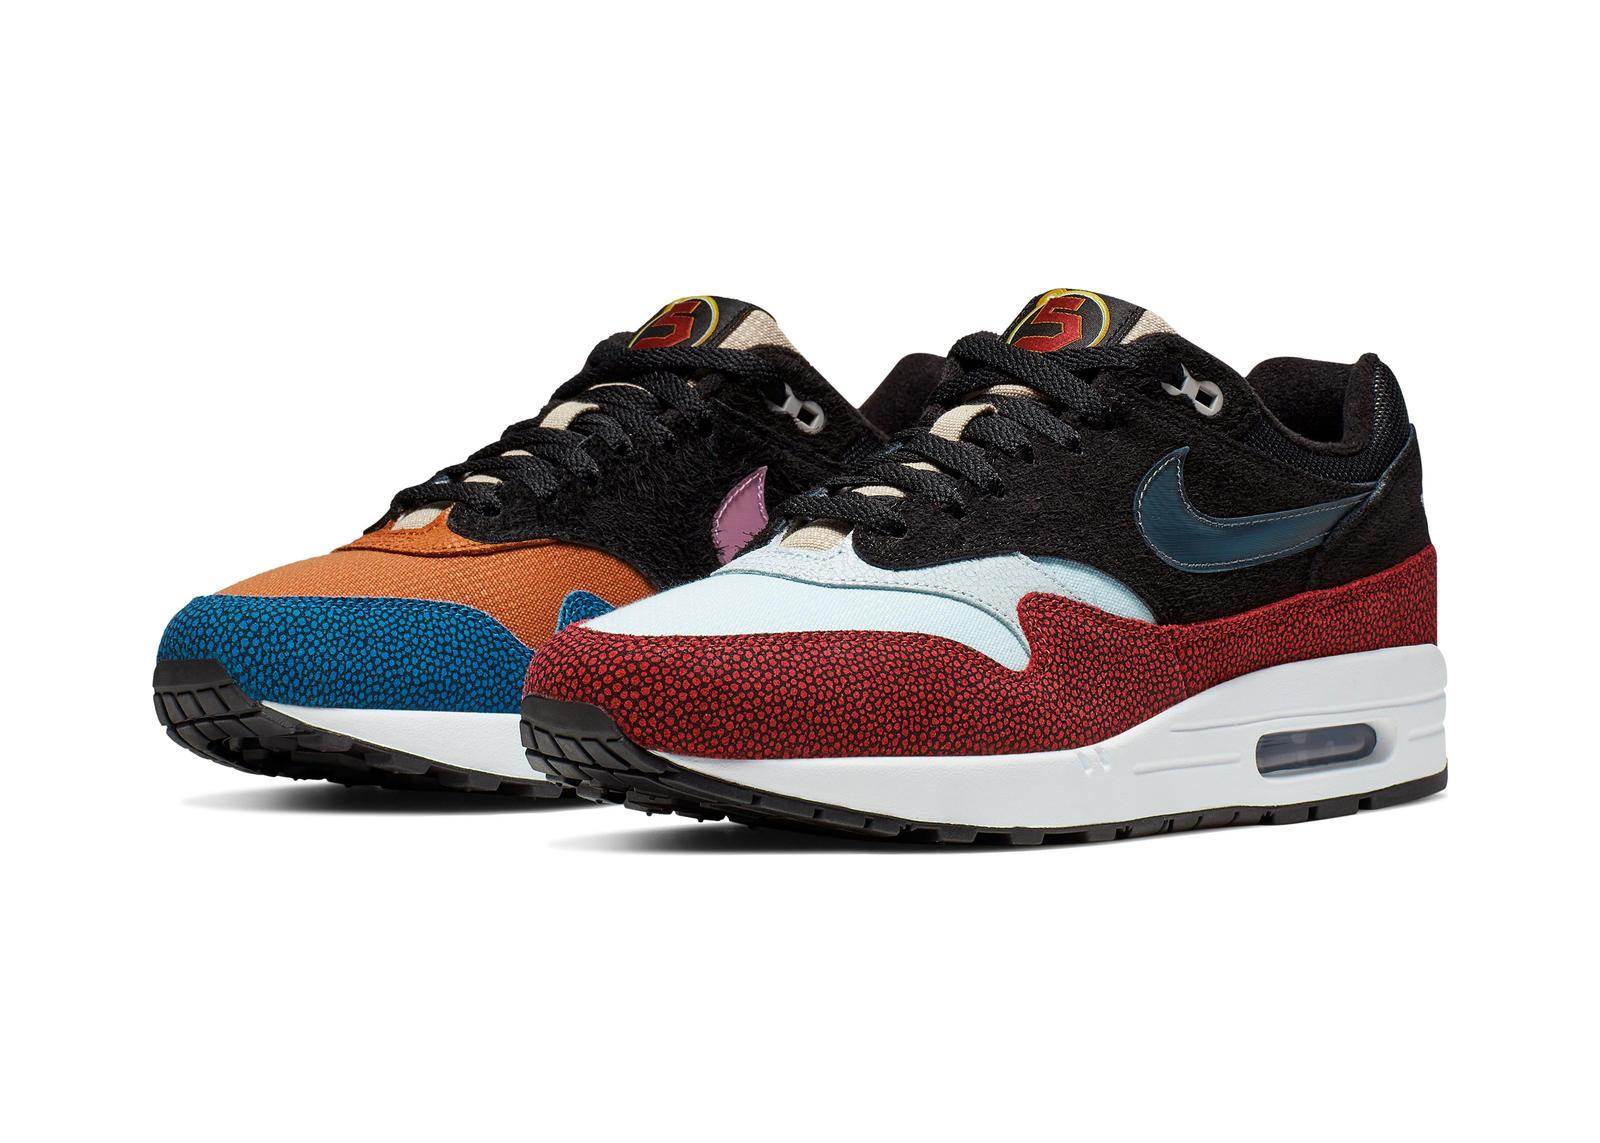 TatumAnd Get FoxJayson Nike Devin Their De'aaron Booker Own nwvN80mO